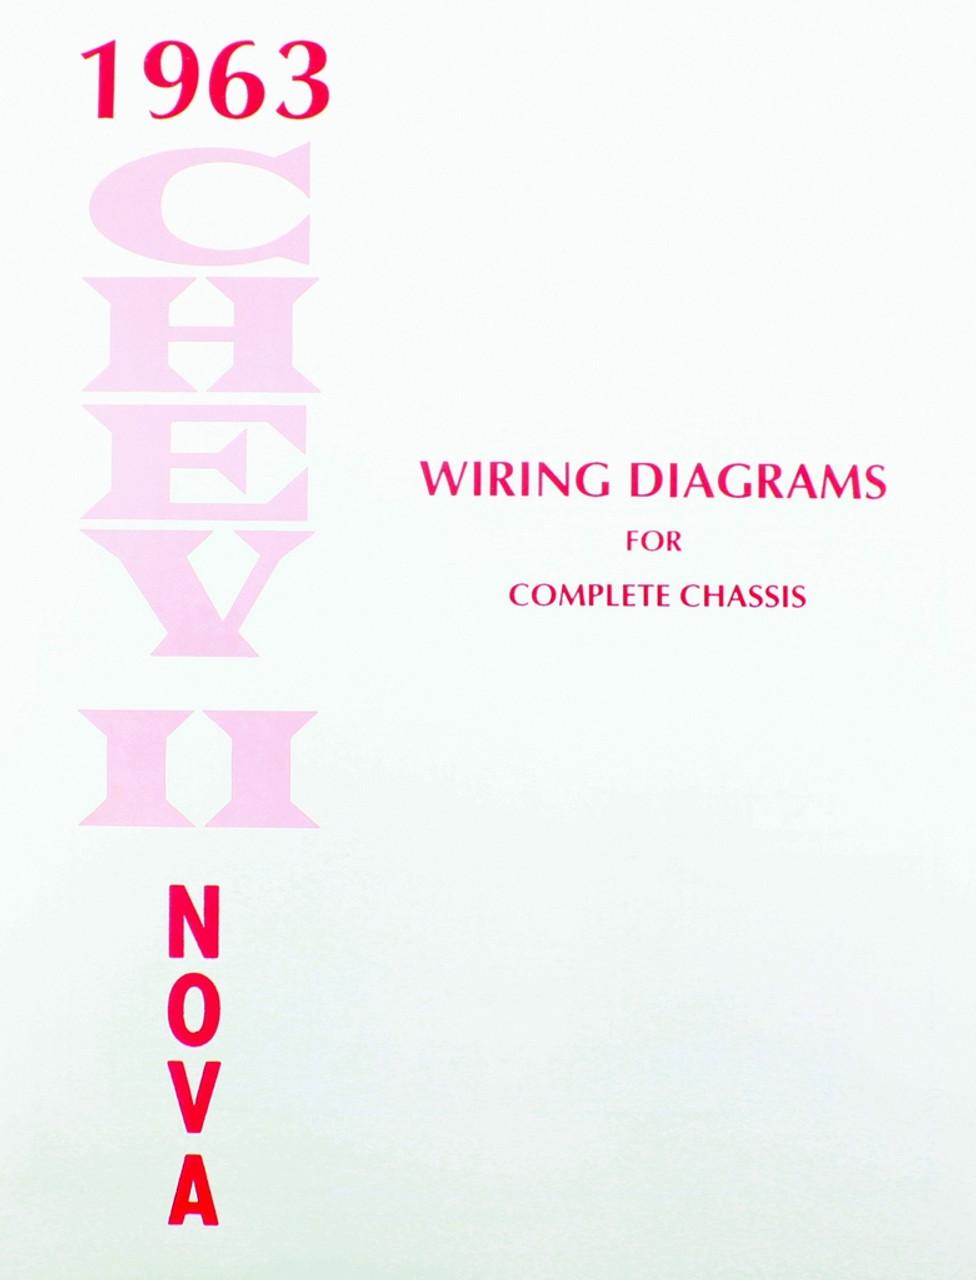 63 Nova Headlight Switch Diagram Schematic Diagrams 1958 Chevrolet Wiring Electrical Work U2022